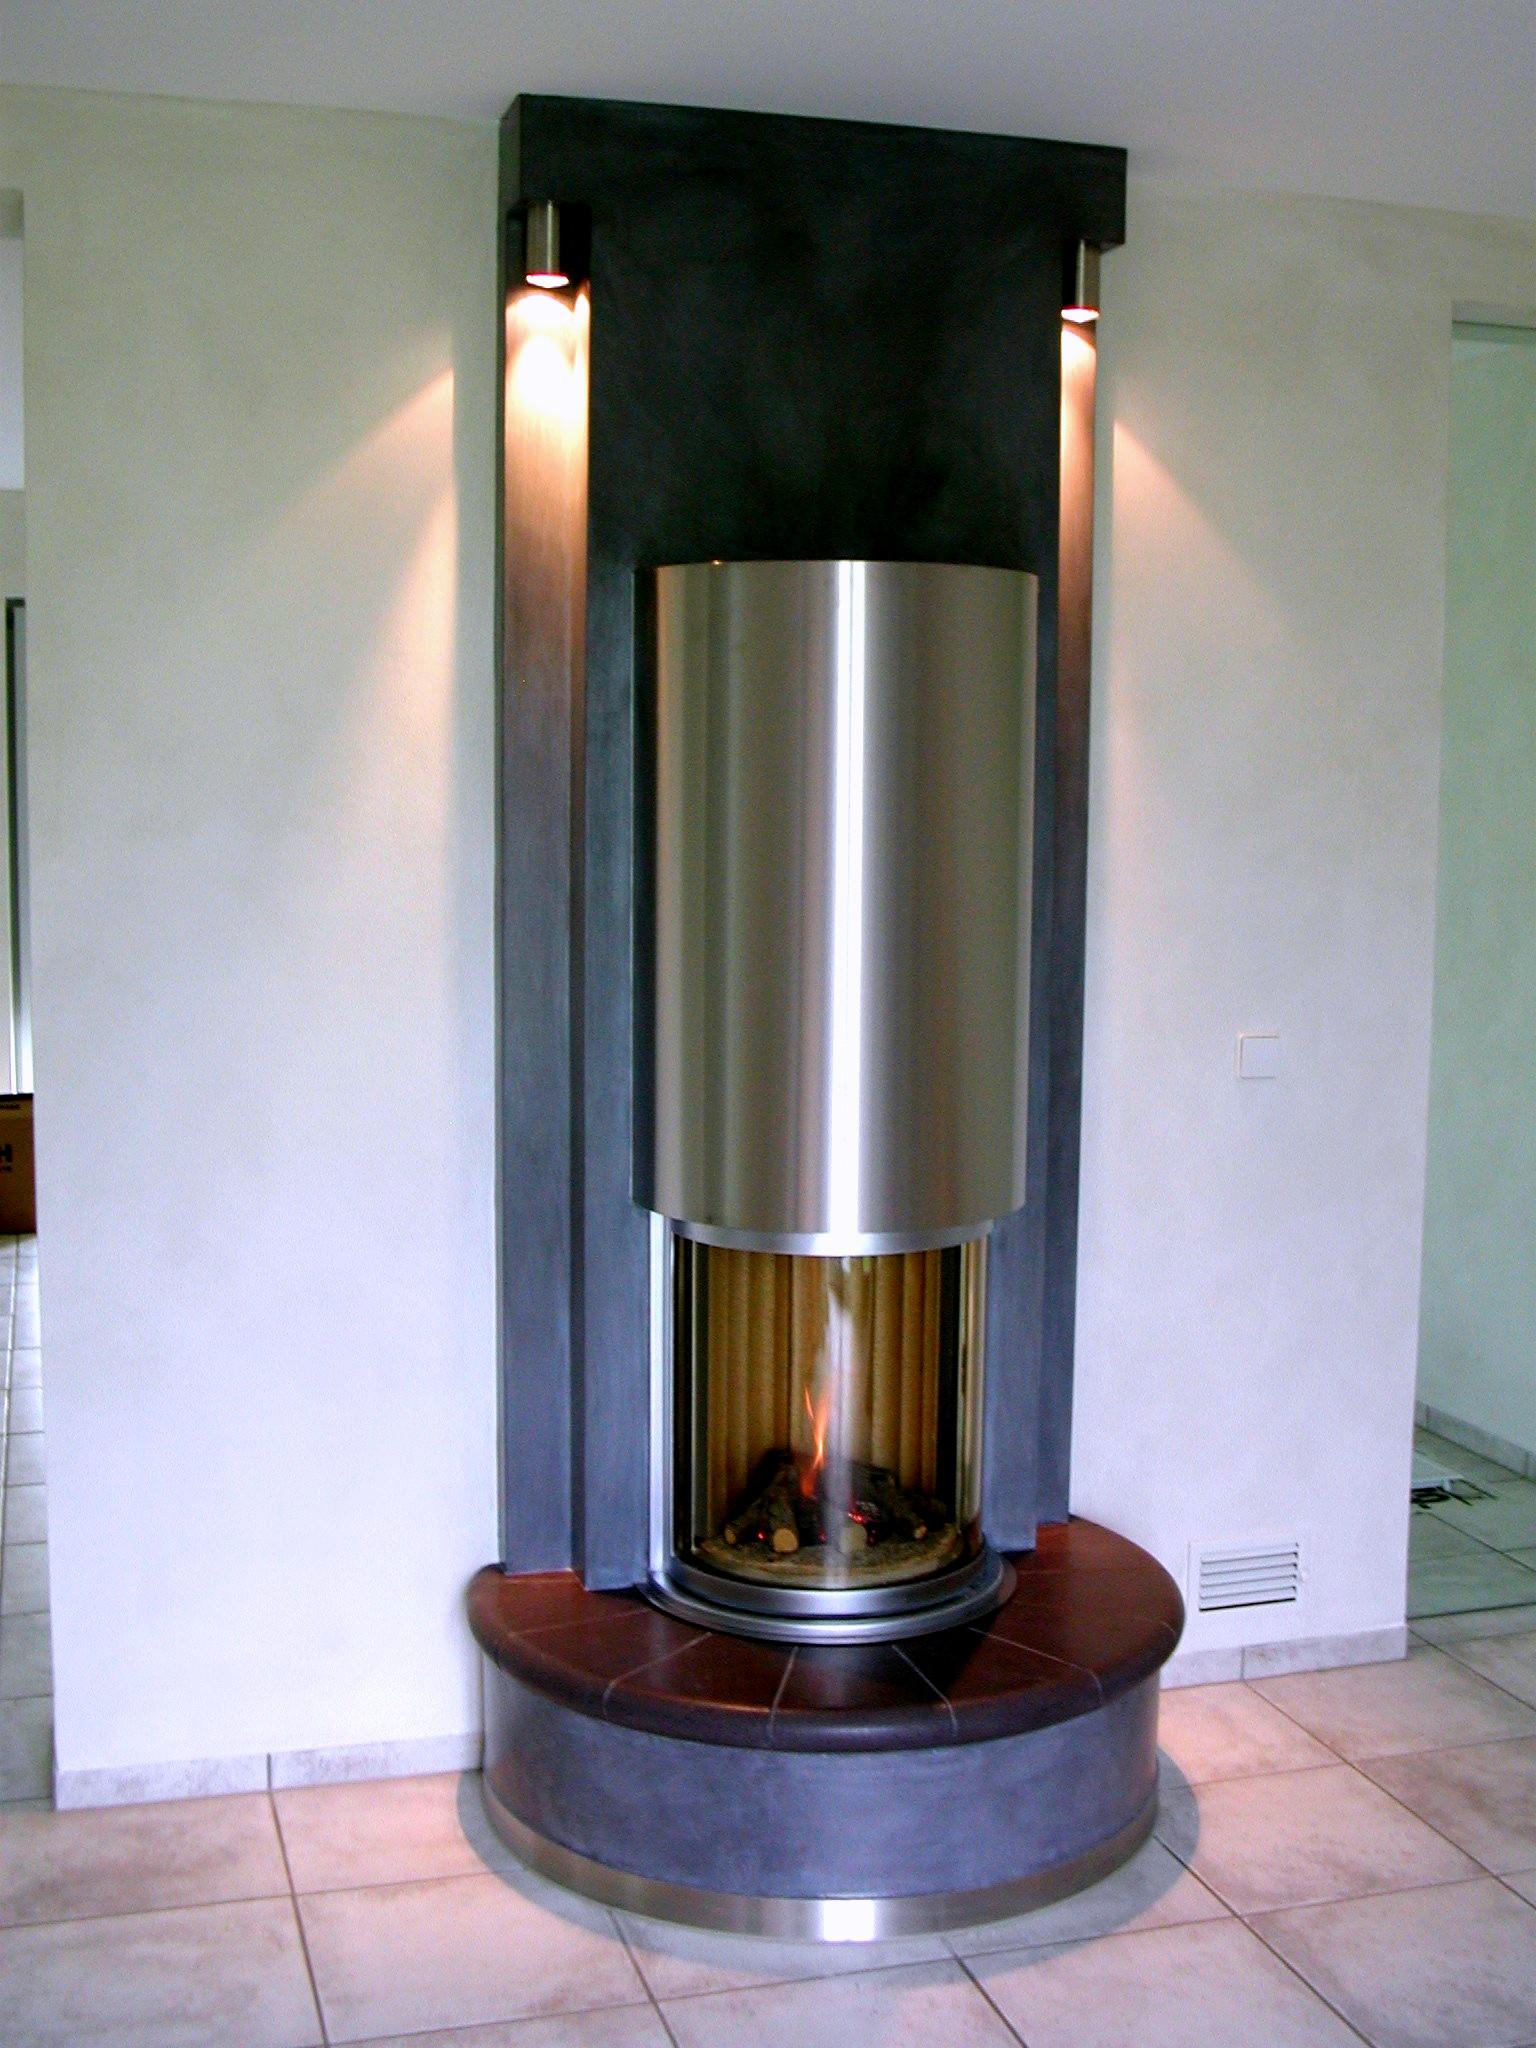 Kamine-180-bis-230-Grad-Glas-15